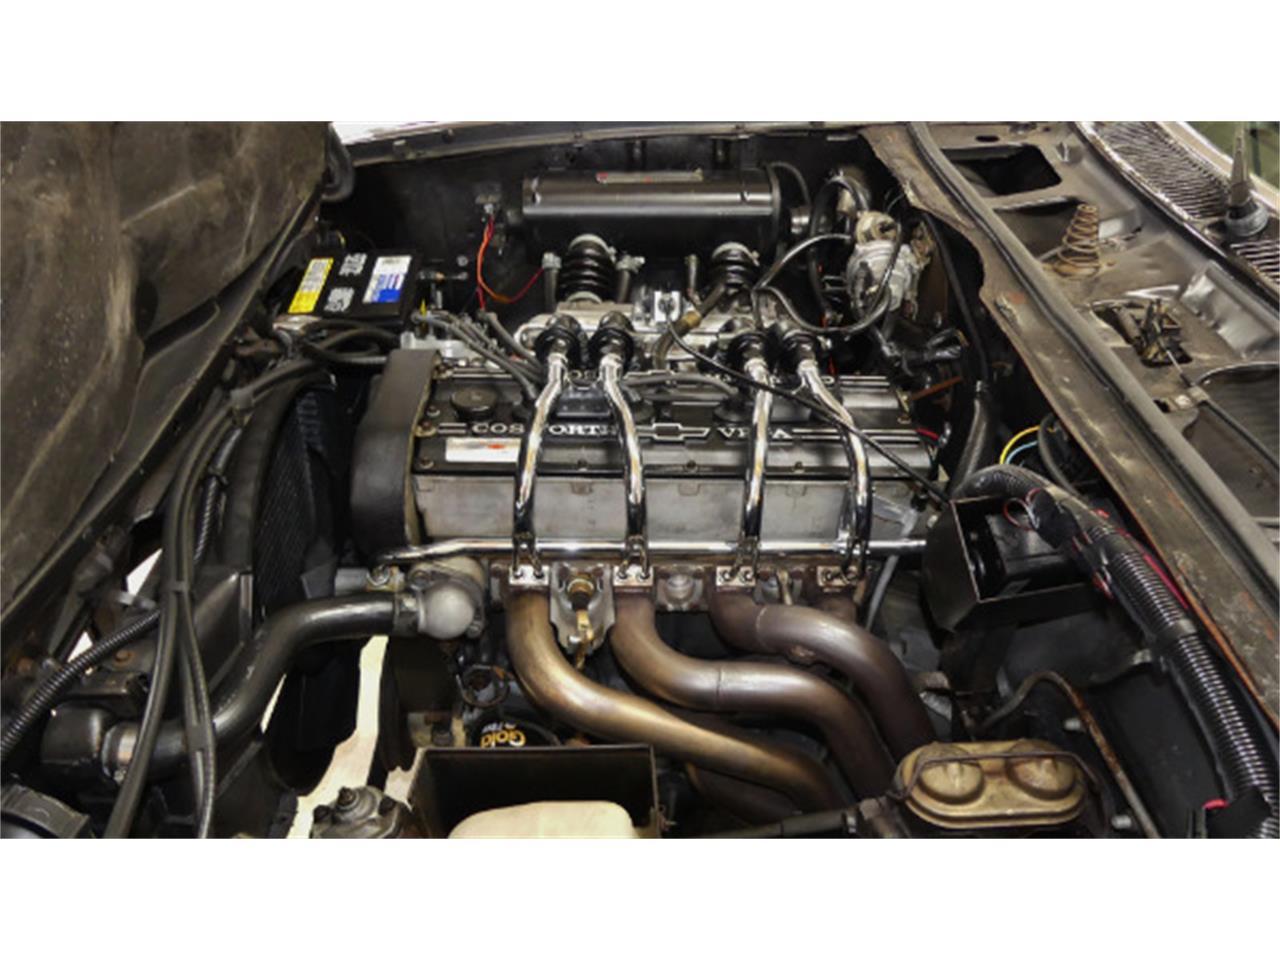 Large Picture of '75 Vega located in Ohio - $15,995.00 Offered by Cruisin Classics - L2U8